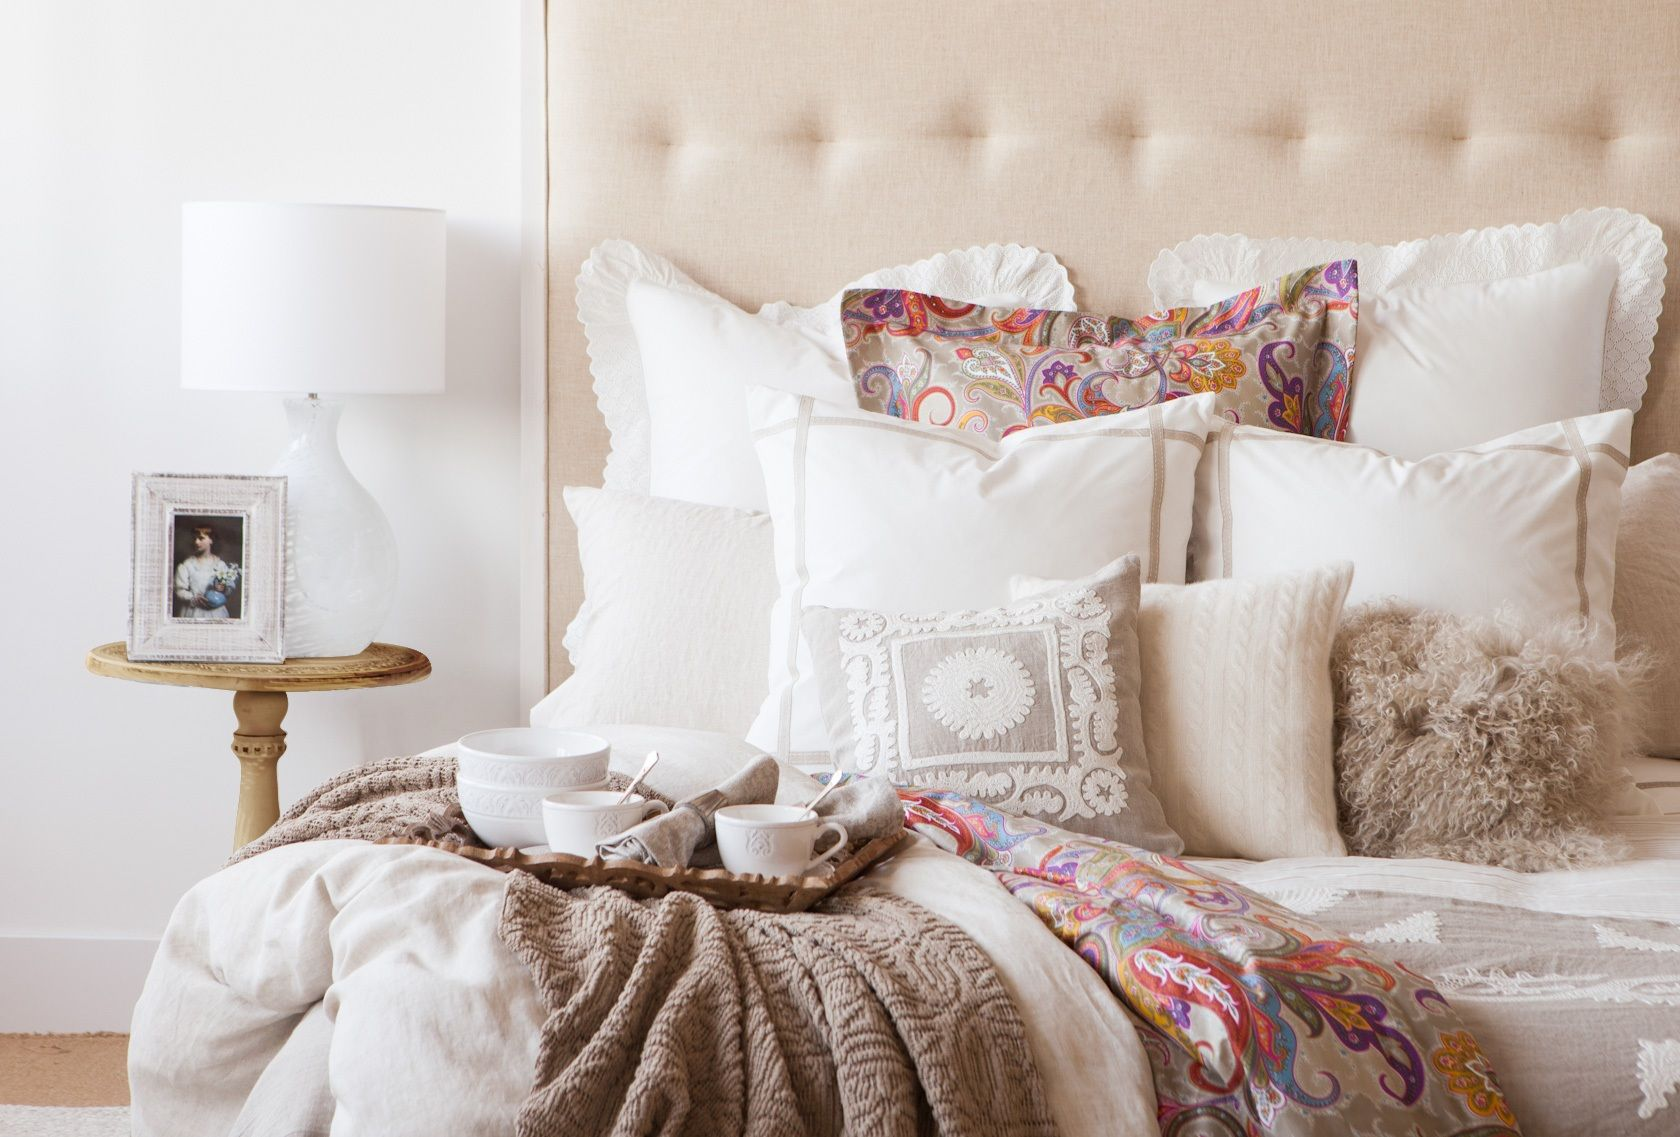 lit zara home france nuits calines pinterest nuit chambres et idee deco. Black Bedroom Furniture Sets. Home Design Ideas